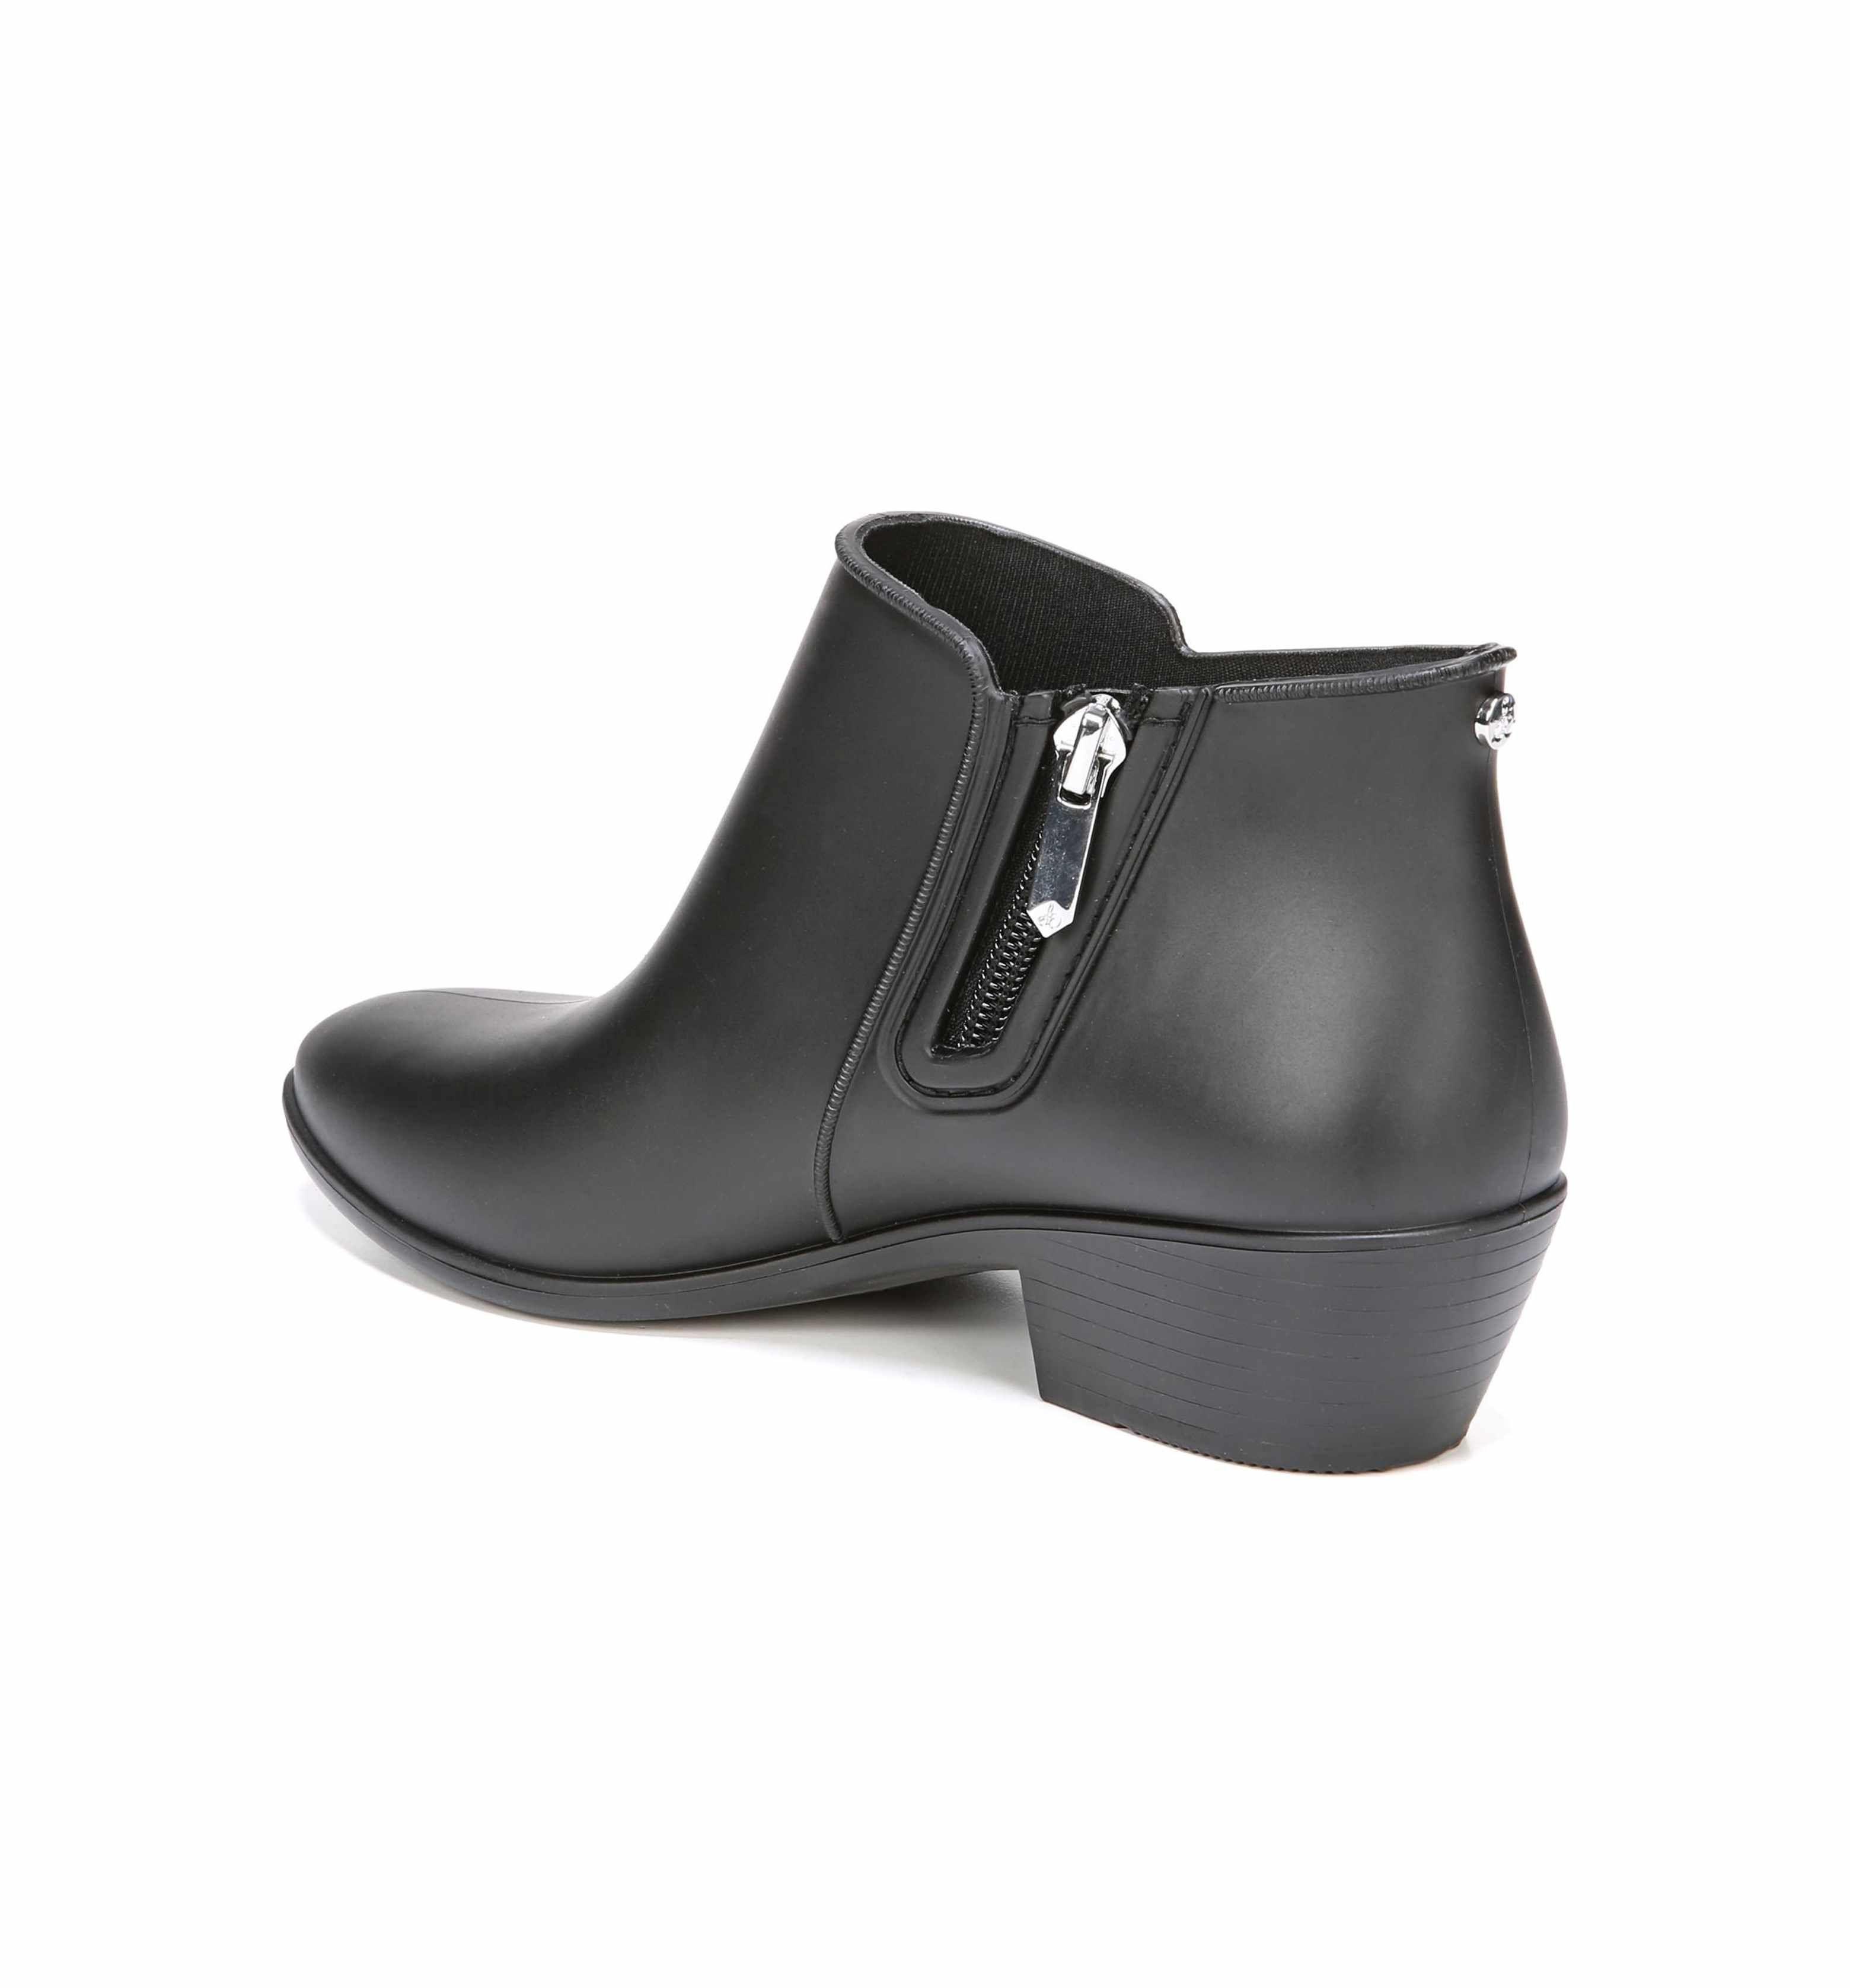 d85f66000 Main Image - Sam Edelman Petty Rain Boot (Women)